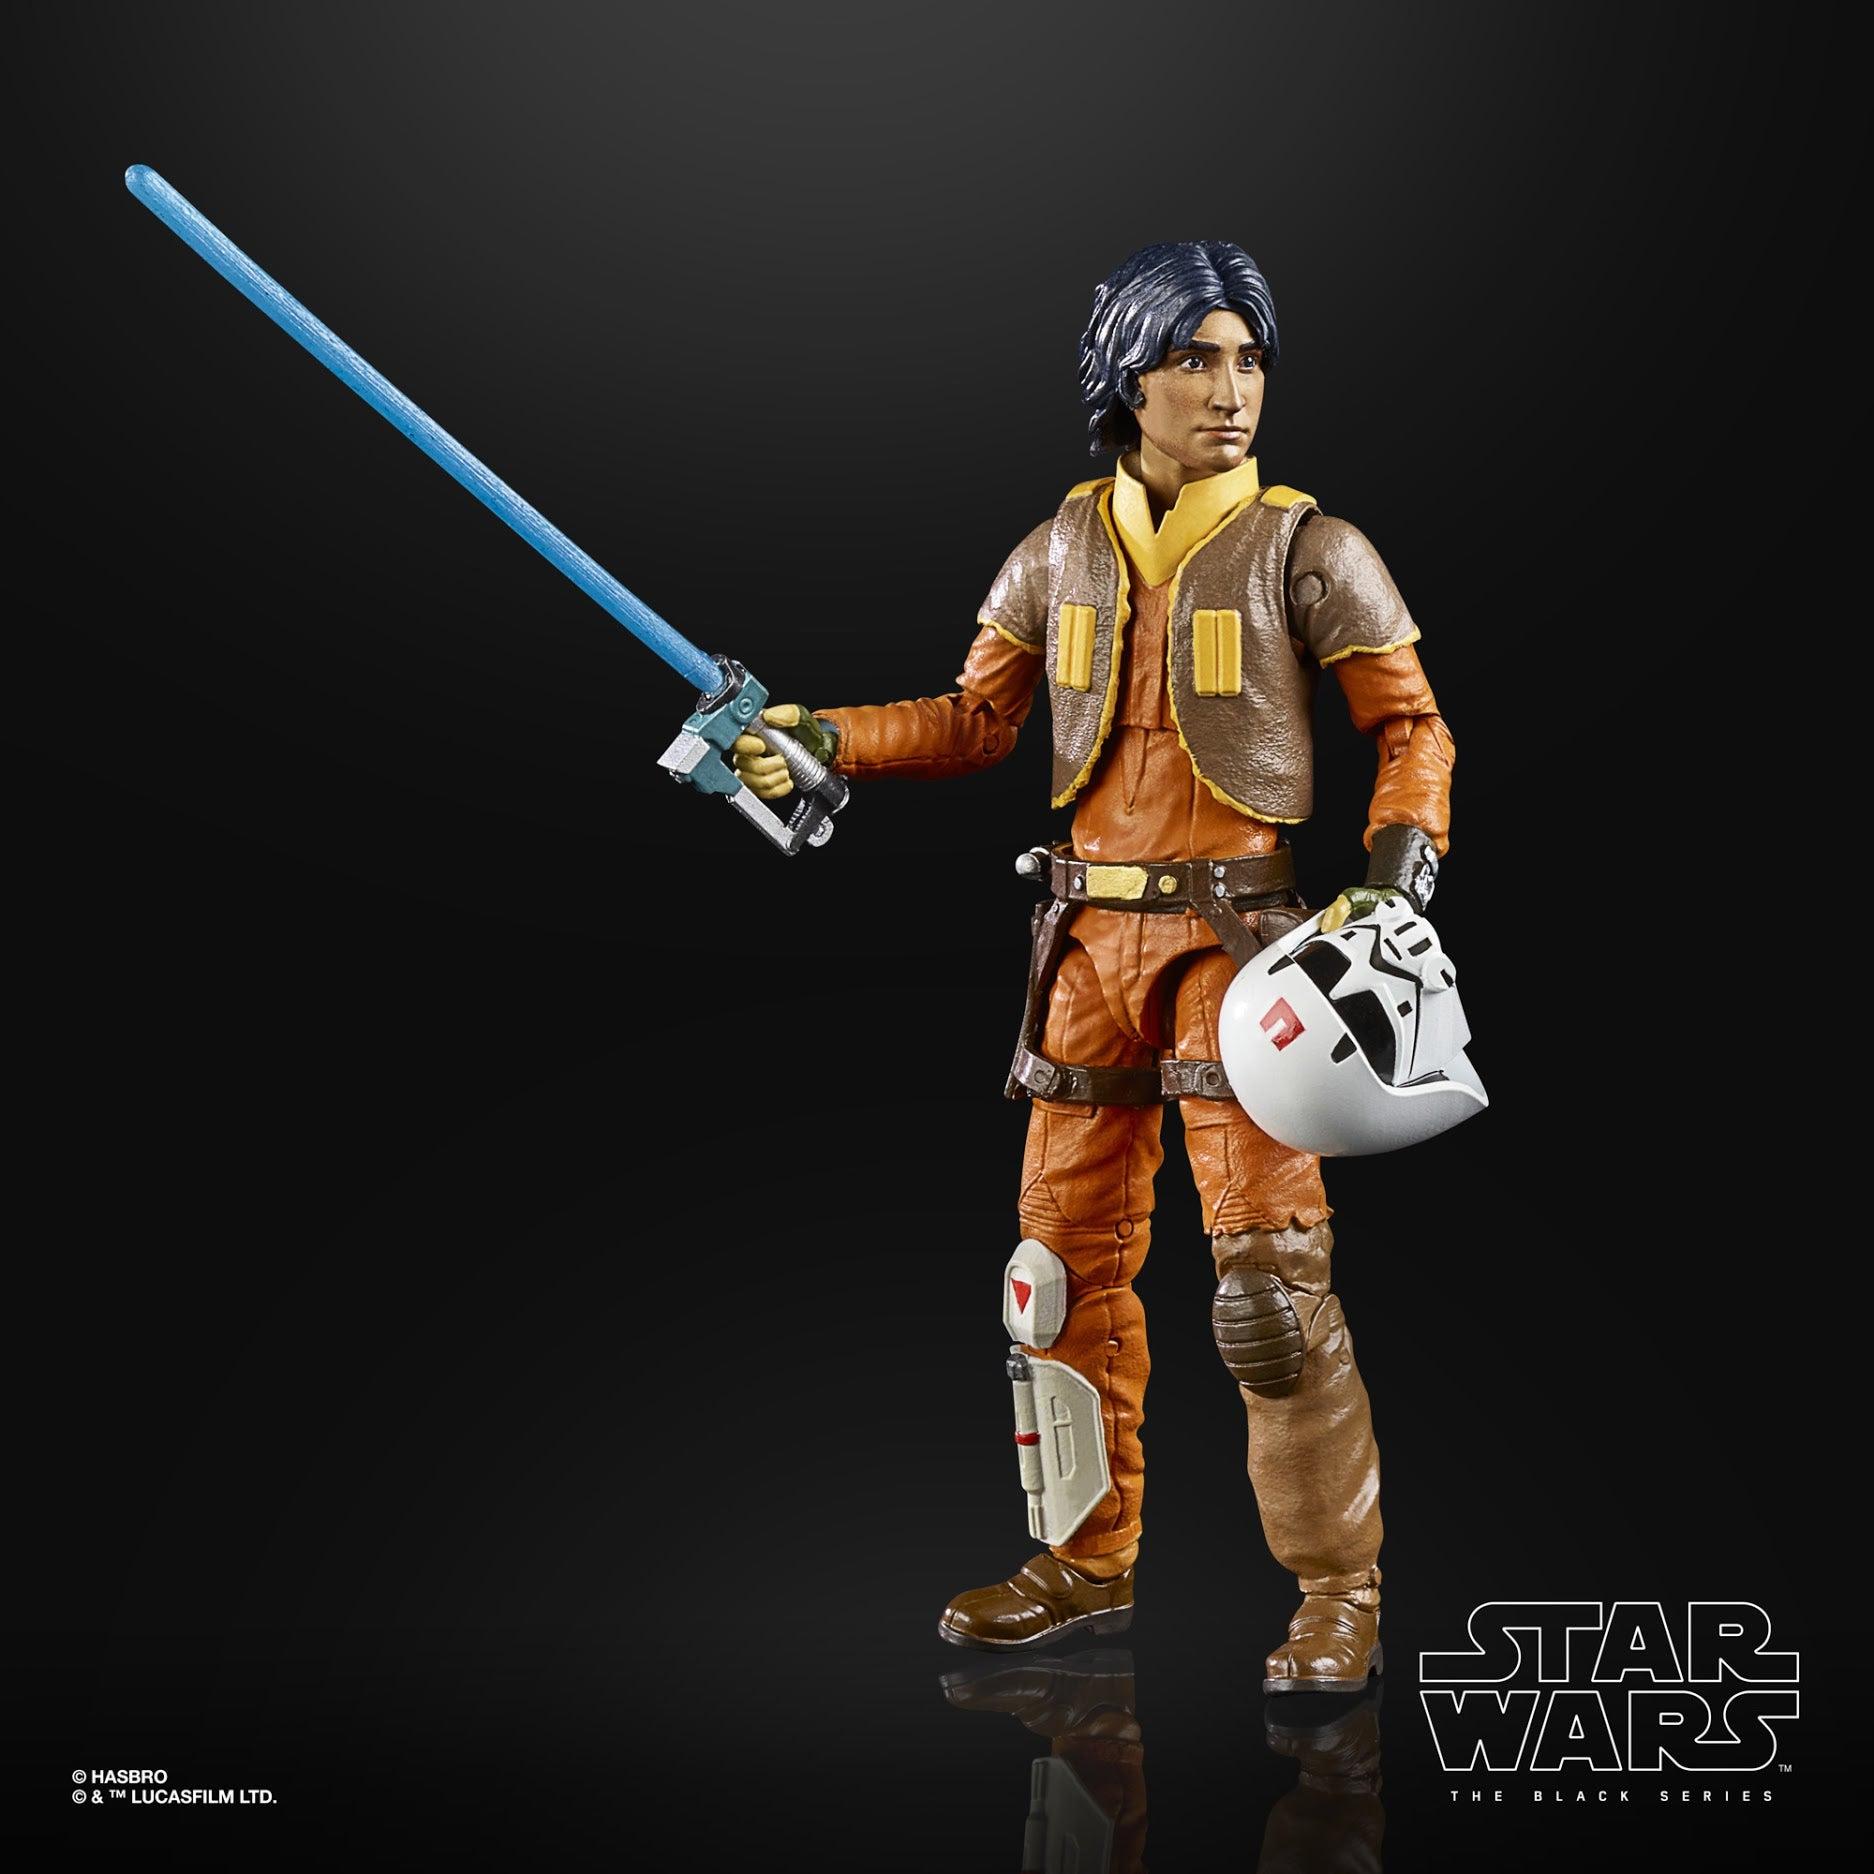 Image of Star Wars The Black Series Rebels Ezra Bridger 6-Inch Action Figure - SEPTEMBER 2020